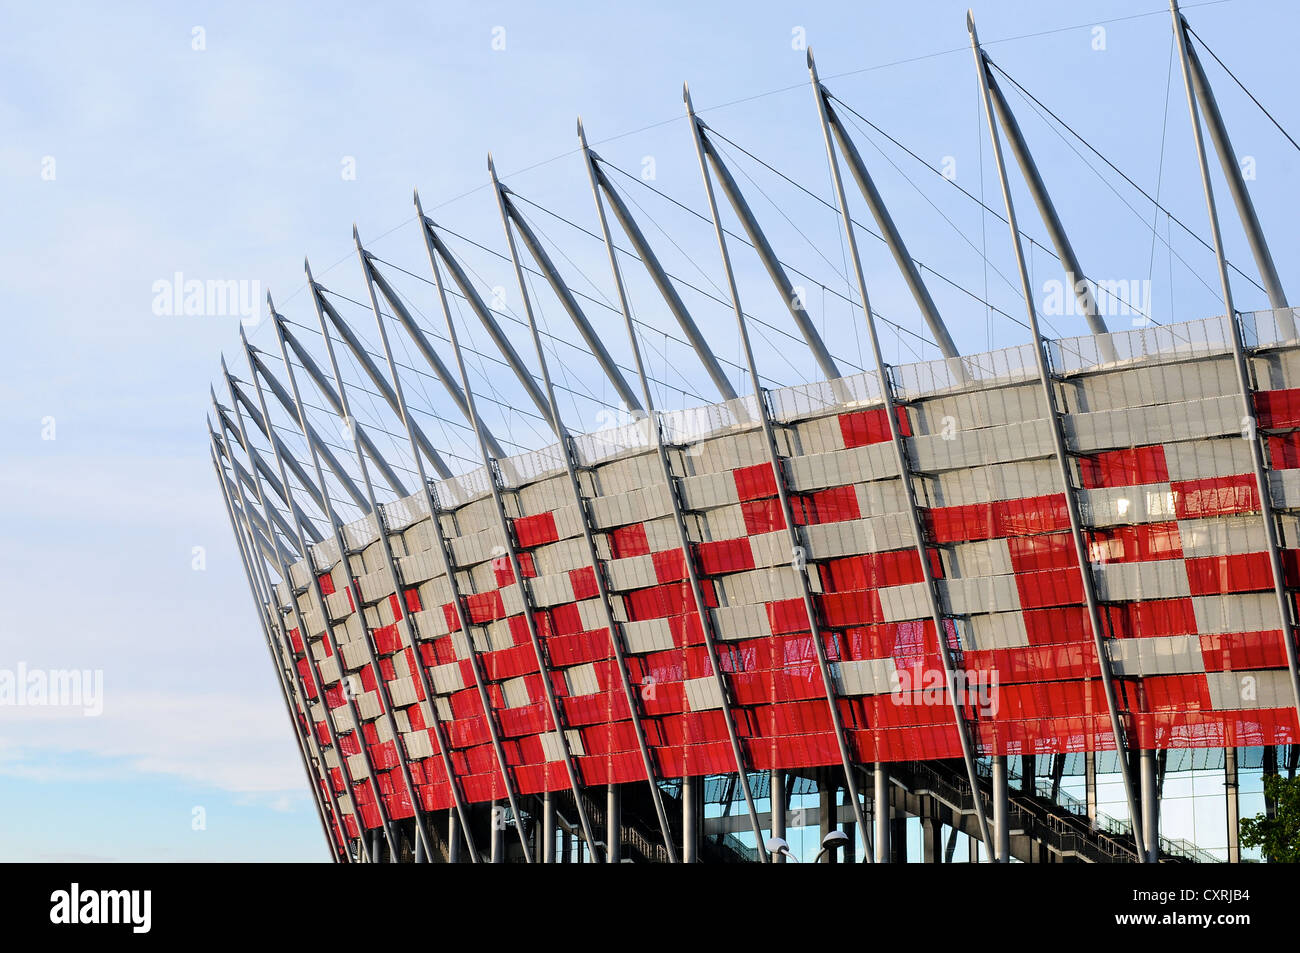 Stadion Narodowy - The National Stadium, Warsaw, Poland - Stock Image